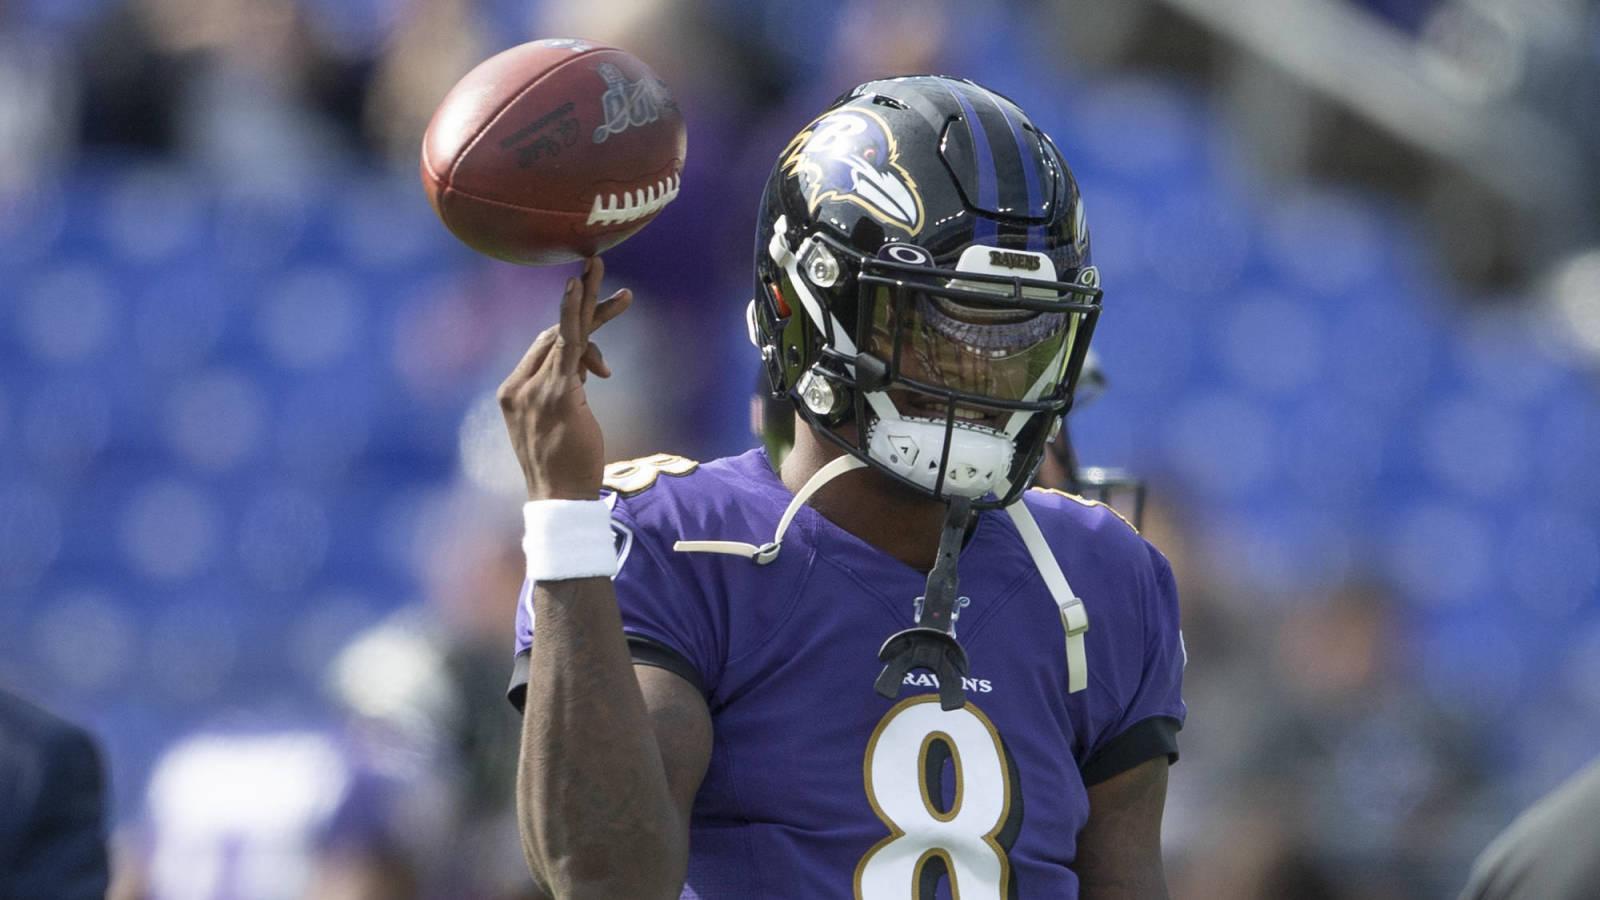 No contract talks between Ravens, Lamar Jackson?